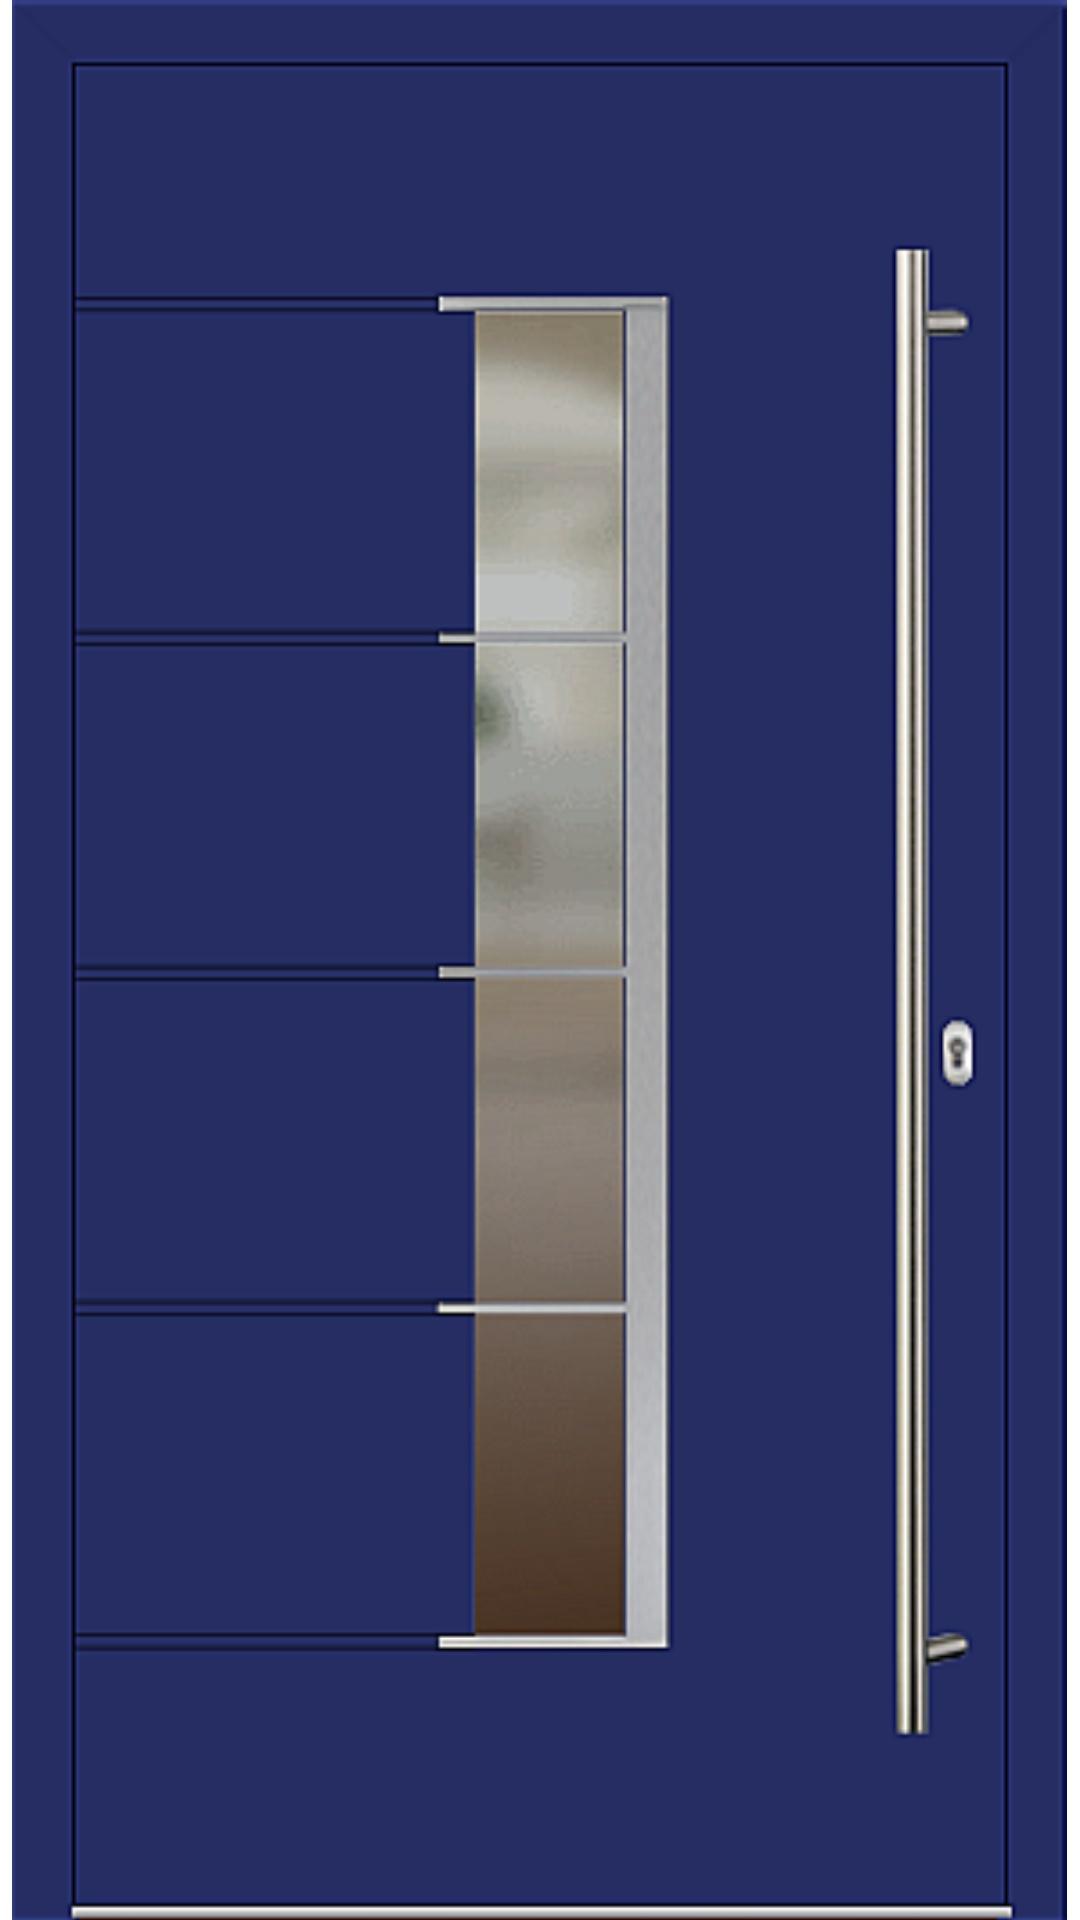 Aluminium Haustür Modell 6978-79 ultramarinblau